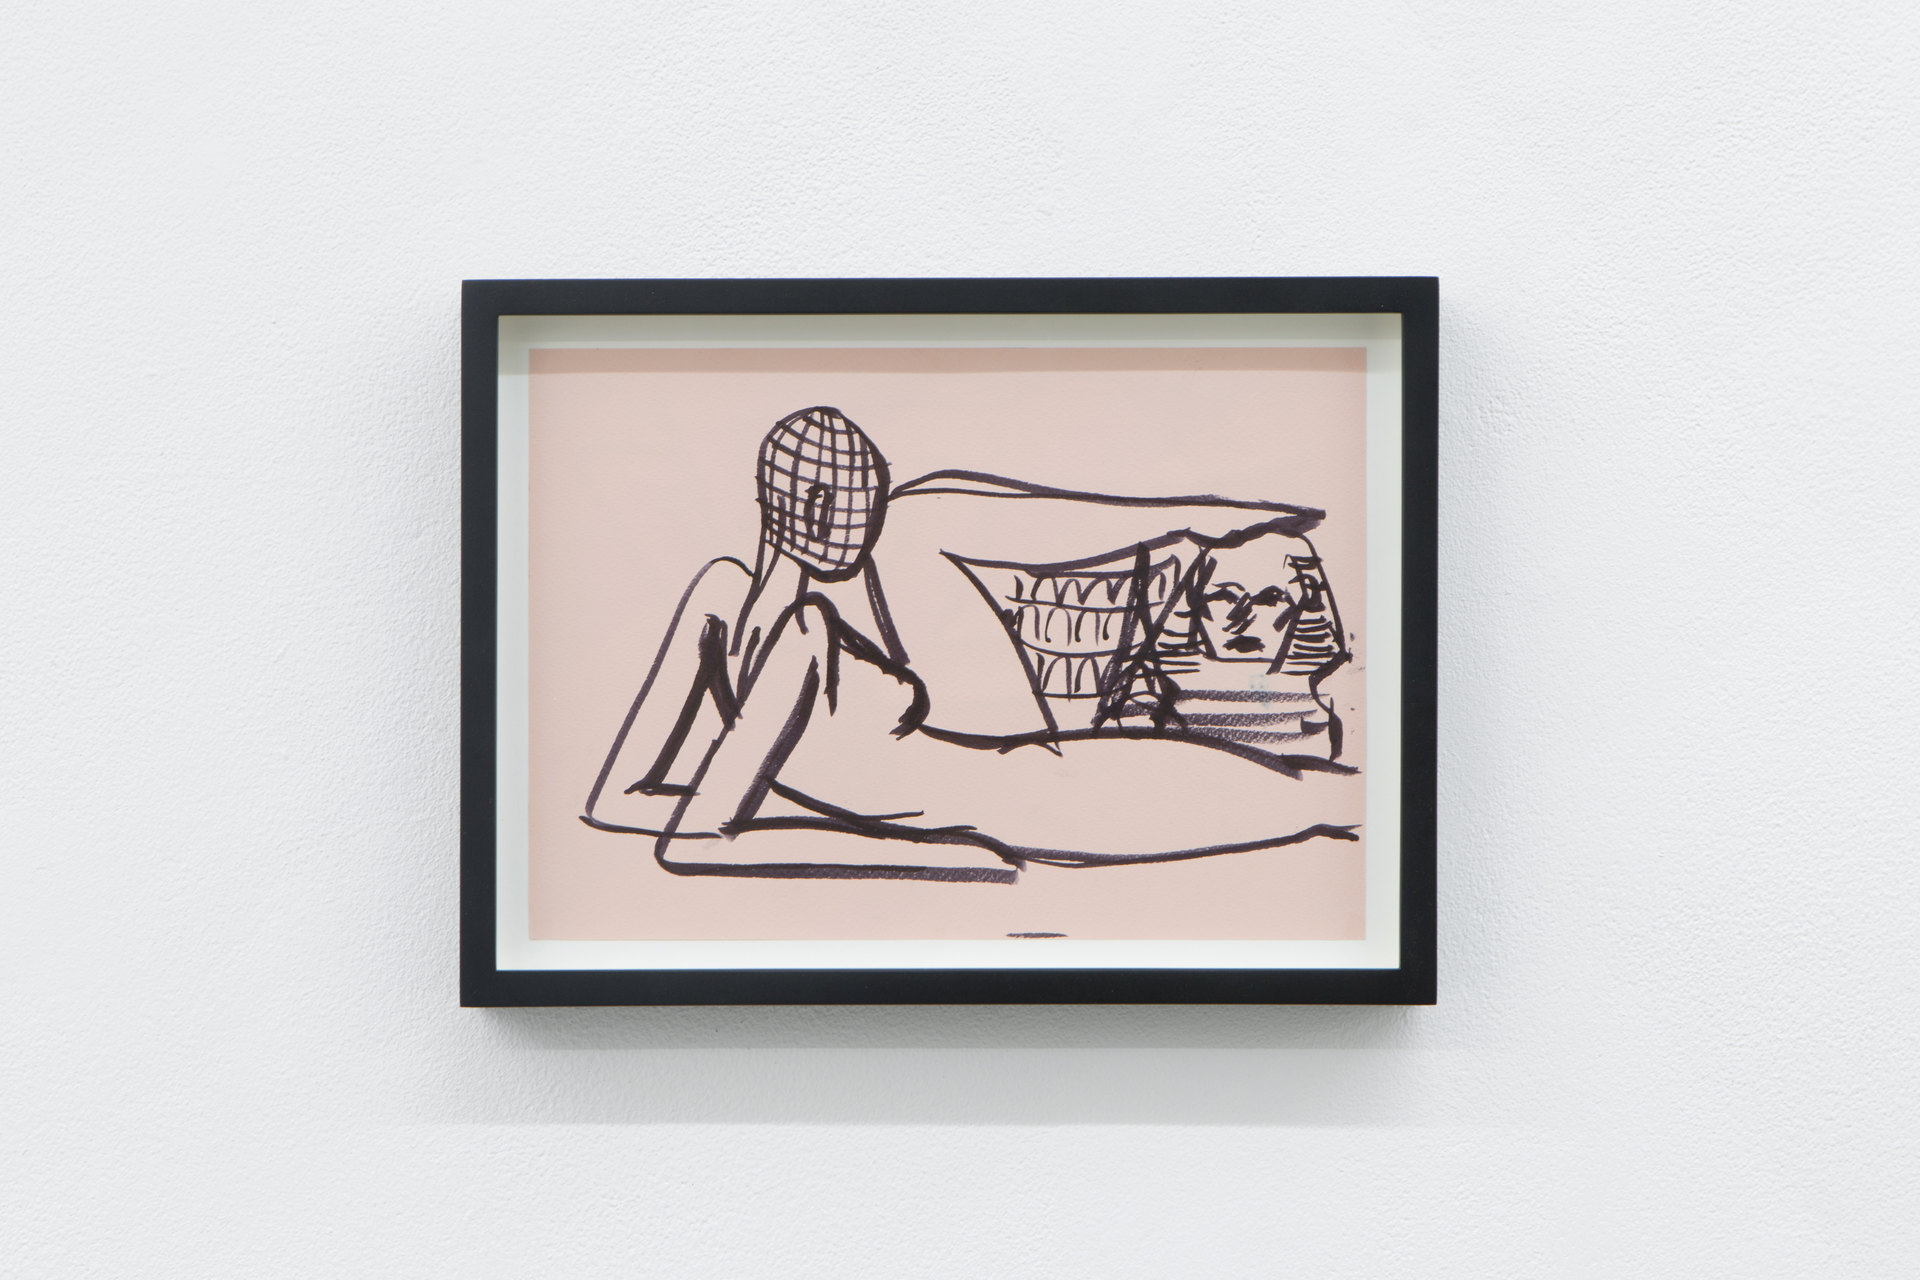 Zuzanna Bartoszek, 'Untitled', 2017, Perverts, Cell Project Space